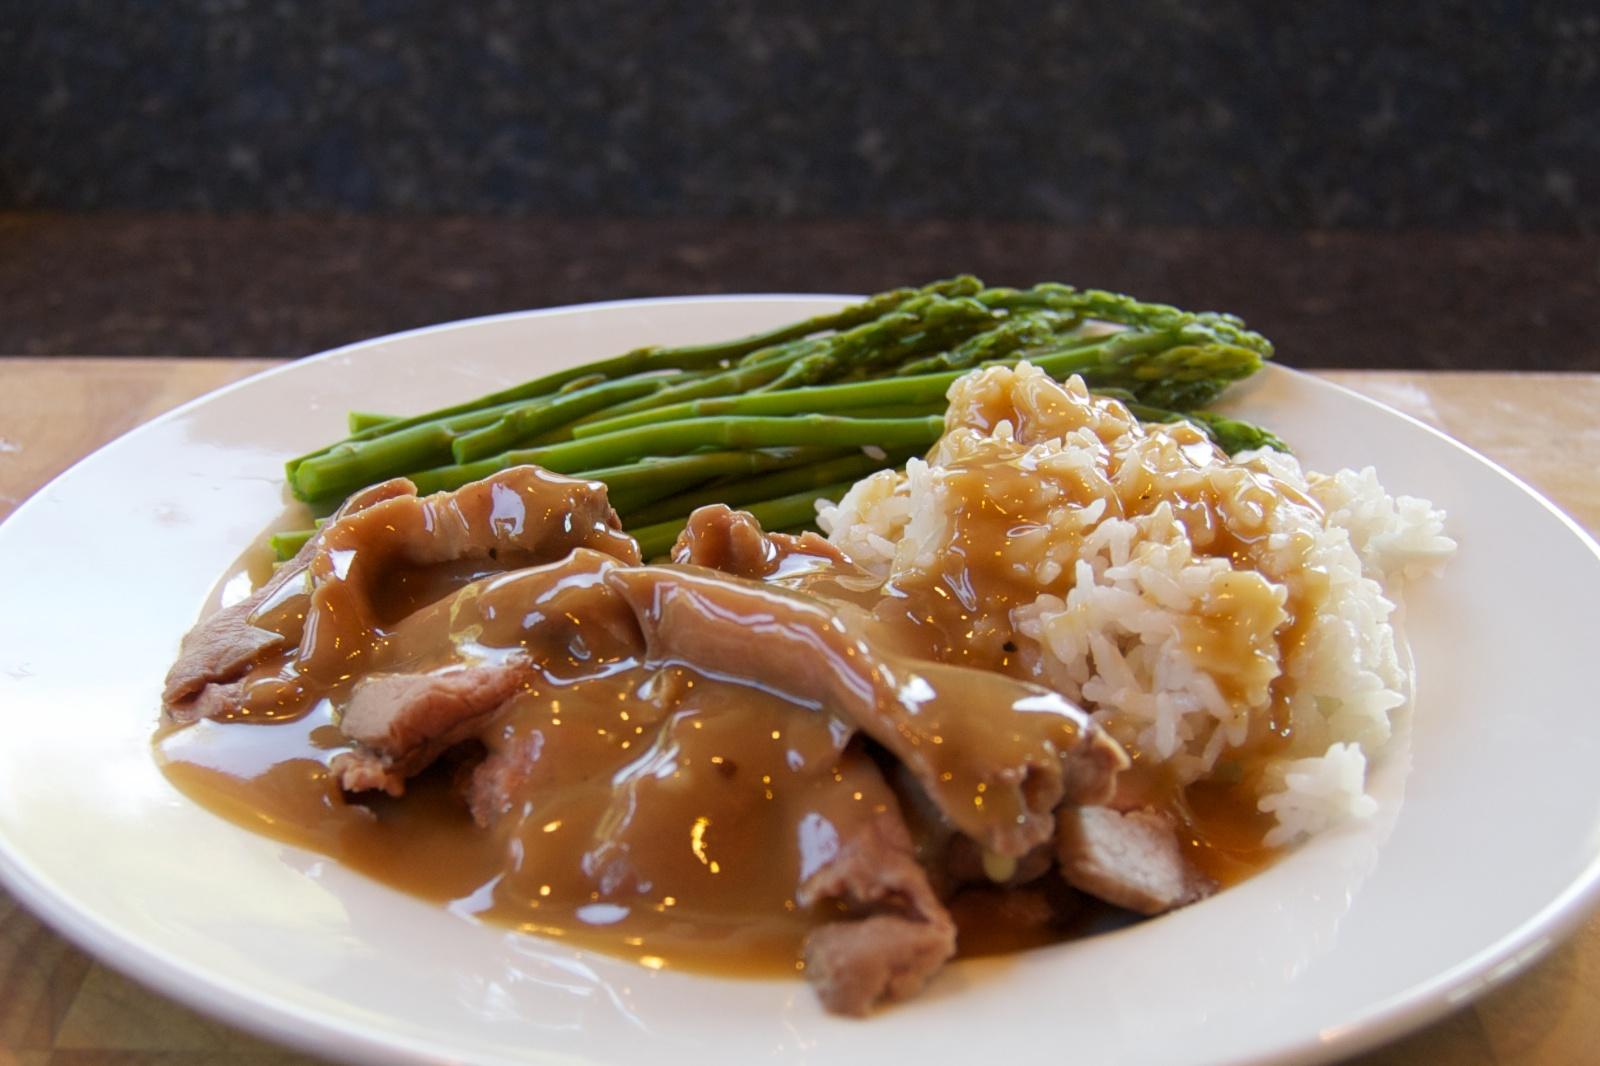 http://blog.rickk.com/food/2011/09/19/ate.2011.09.19.d.jpg